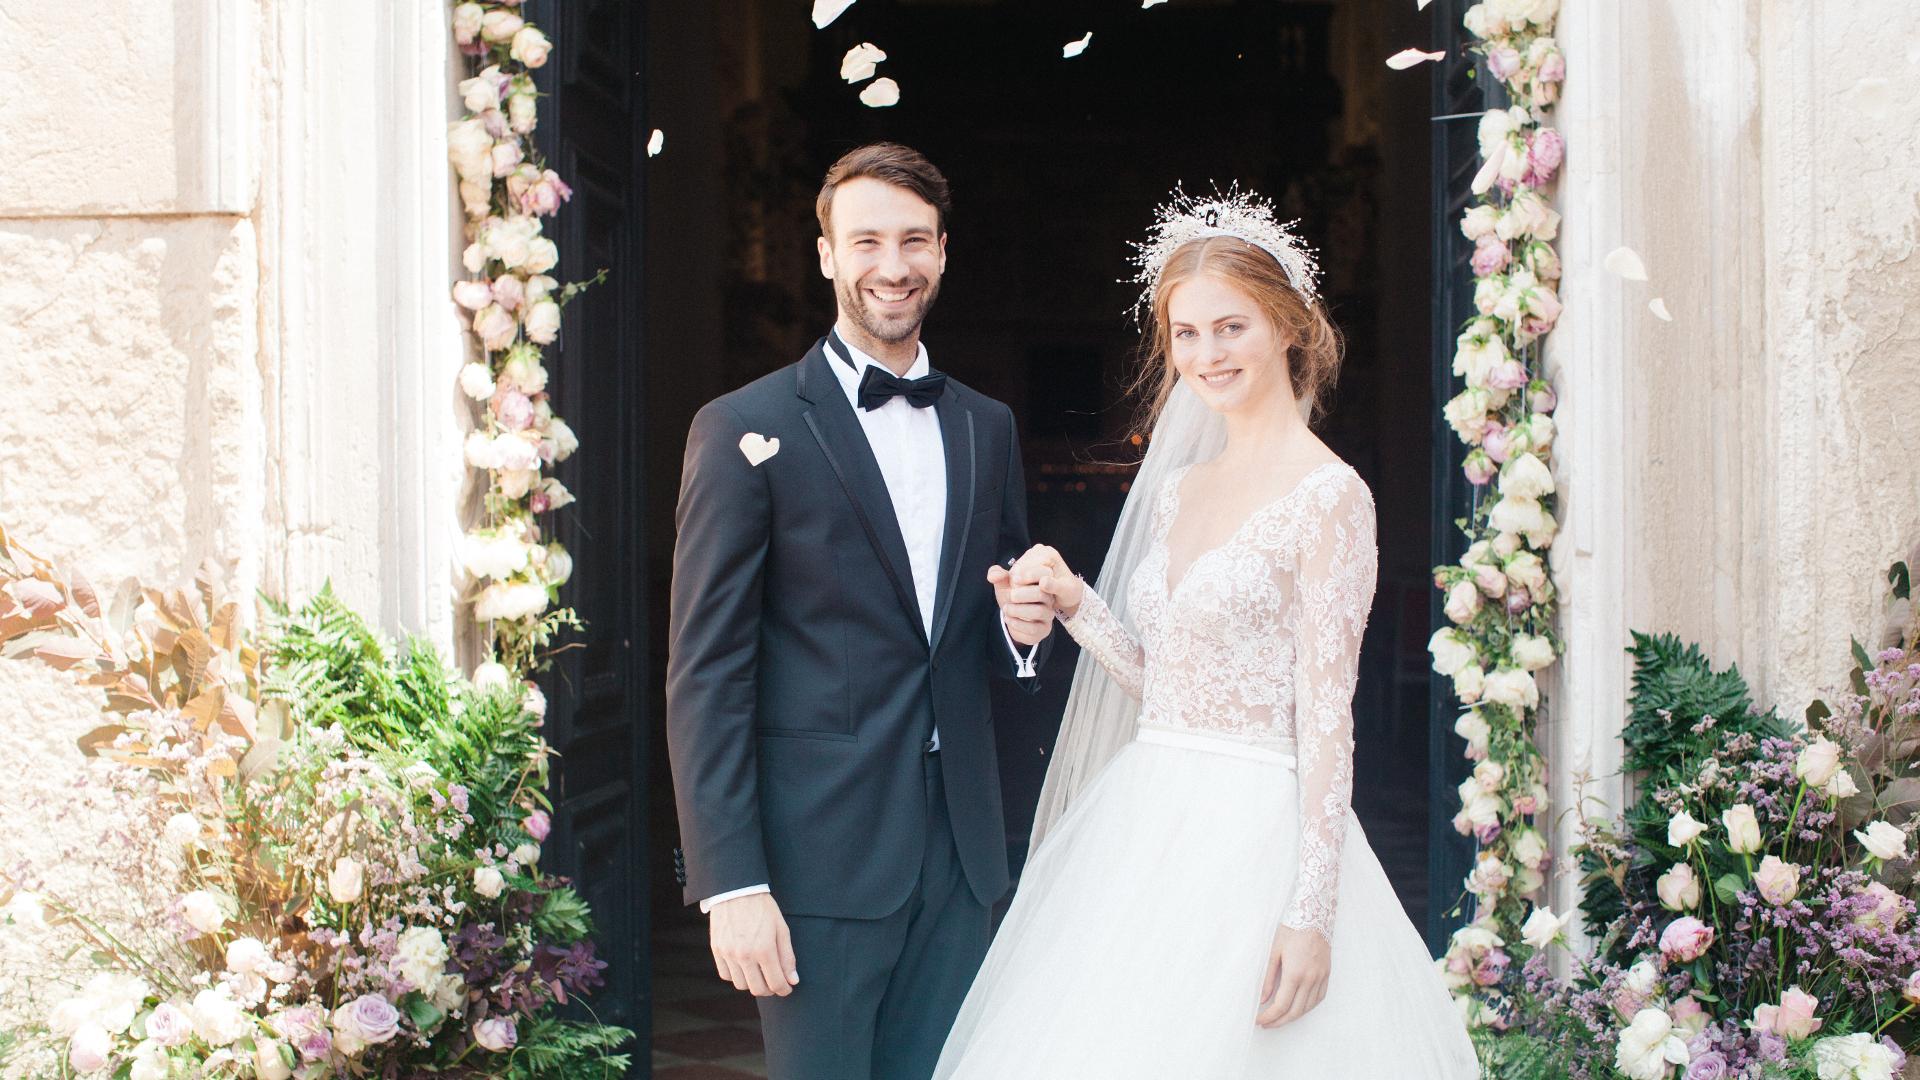 matrimonio da favola al San Clemente Palace Kempinski